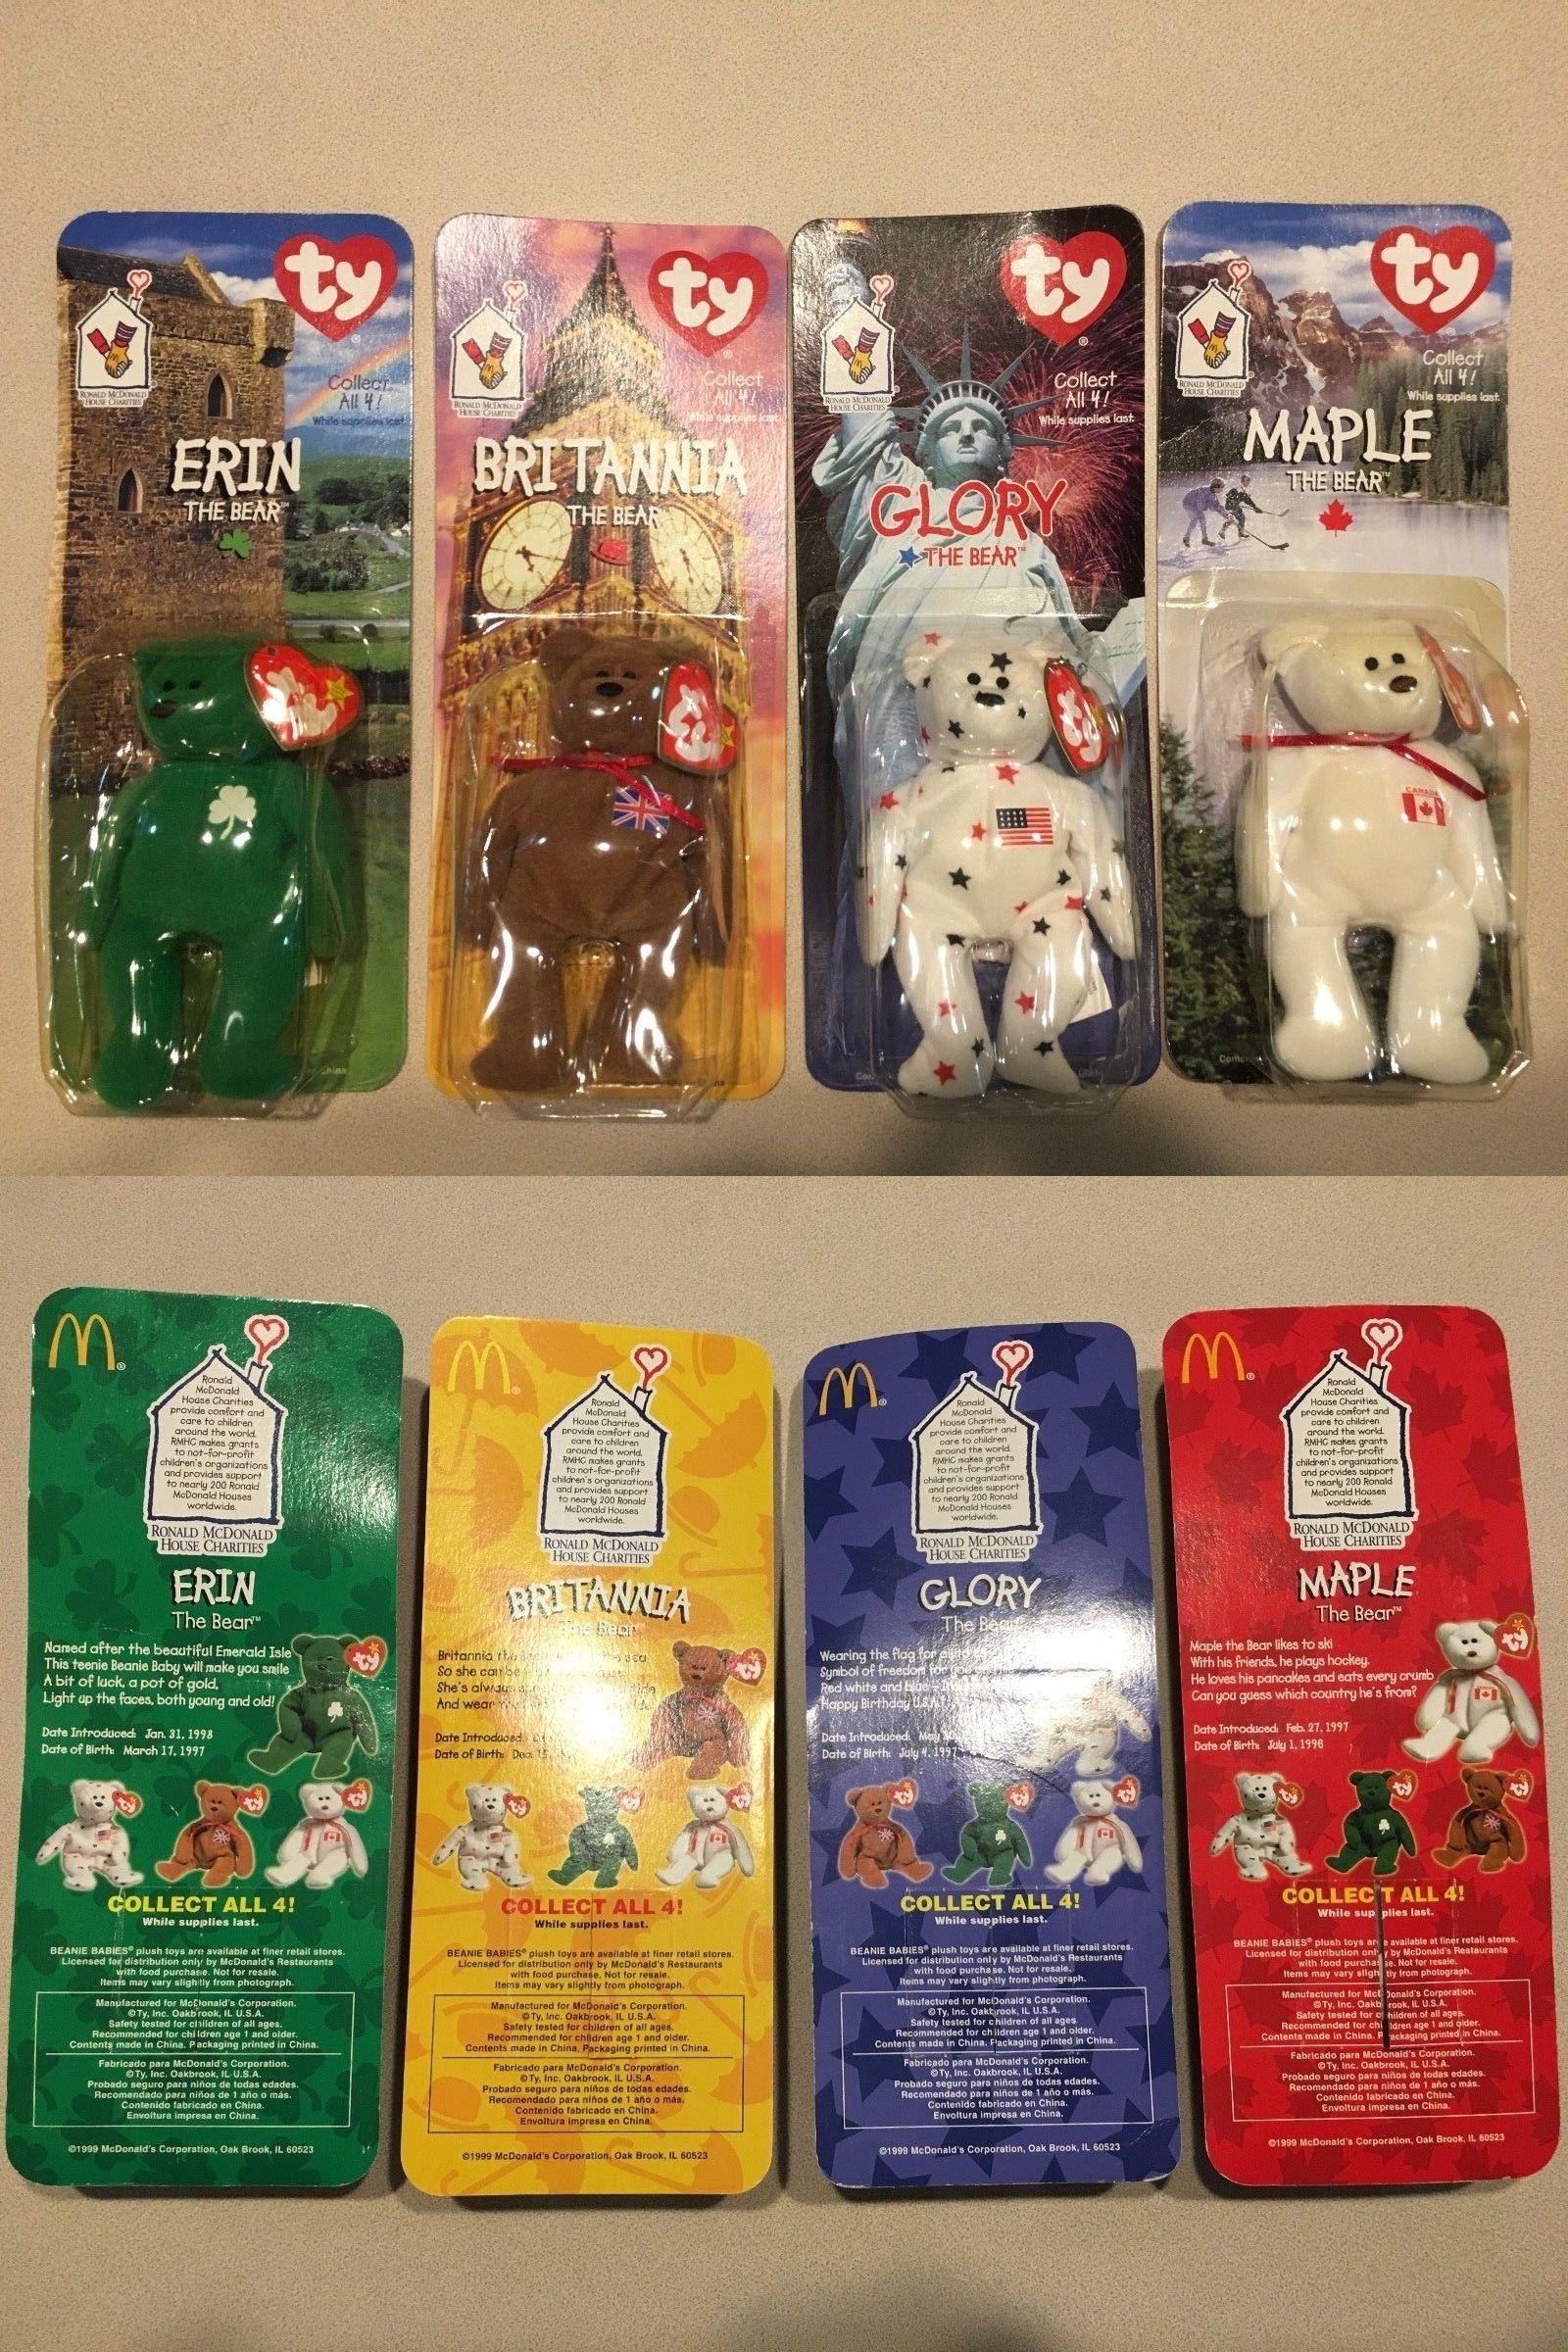 8137eb2428b Teenie Beanies 441  Ty 1999 Mcdonald S Beanie Babies Intl. Bears Error  Collection (4) Rare!!! -  BUY IT NOW ONLY   49.95 on  eBay  teenie  beanies   mcdonald ...